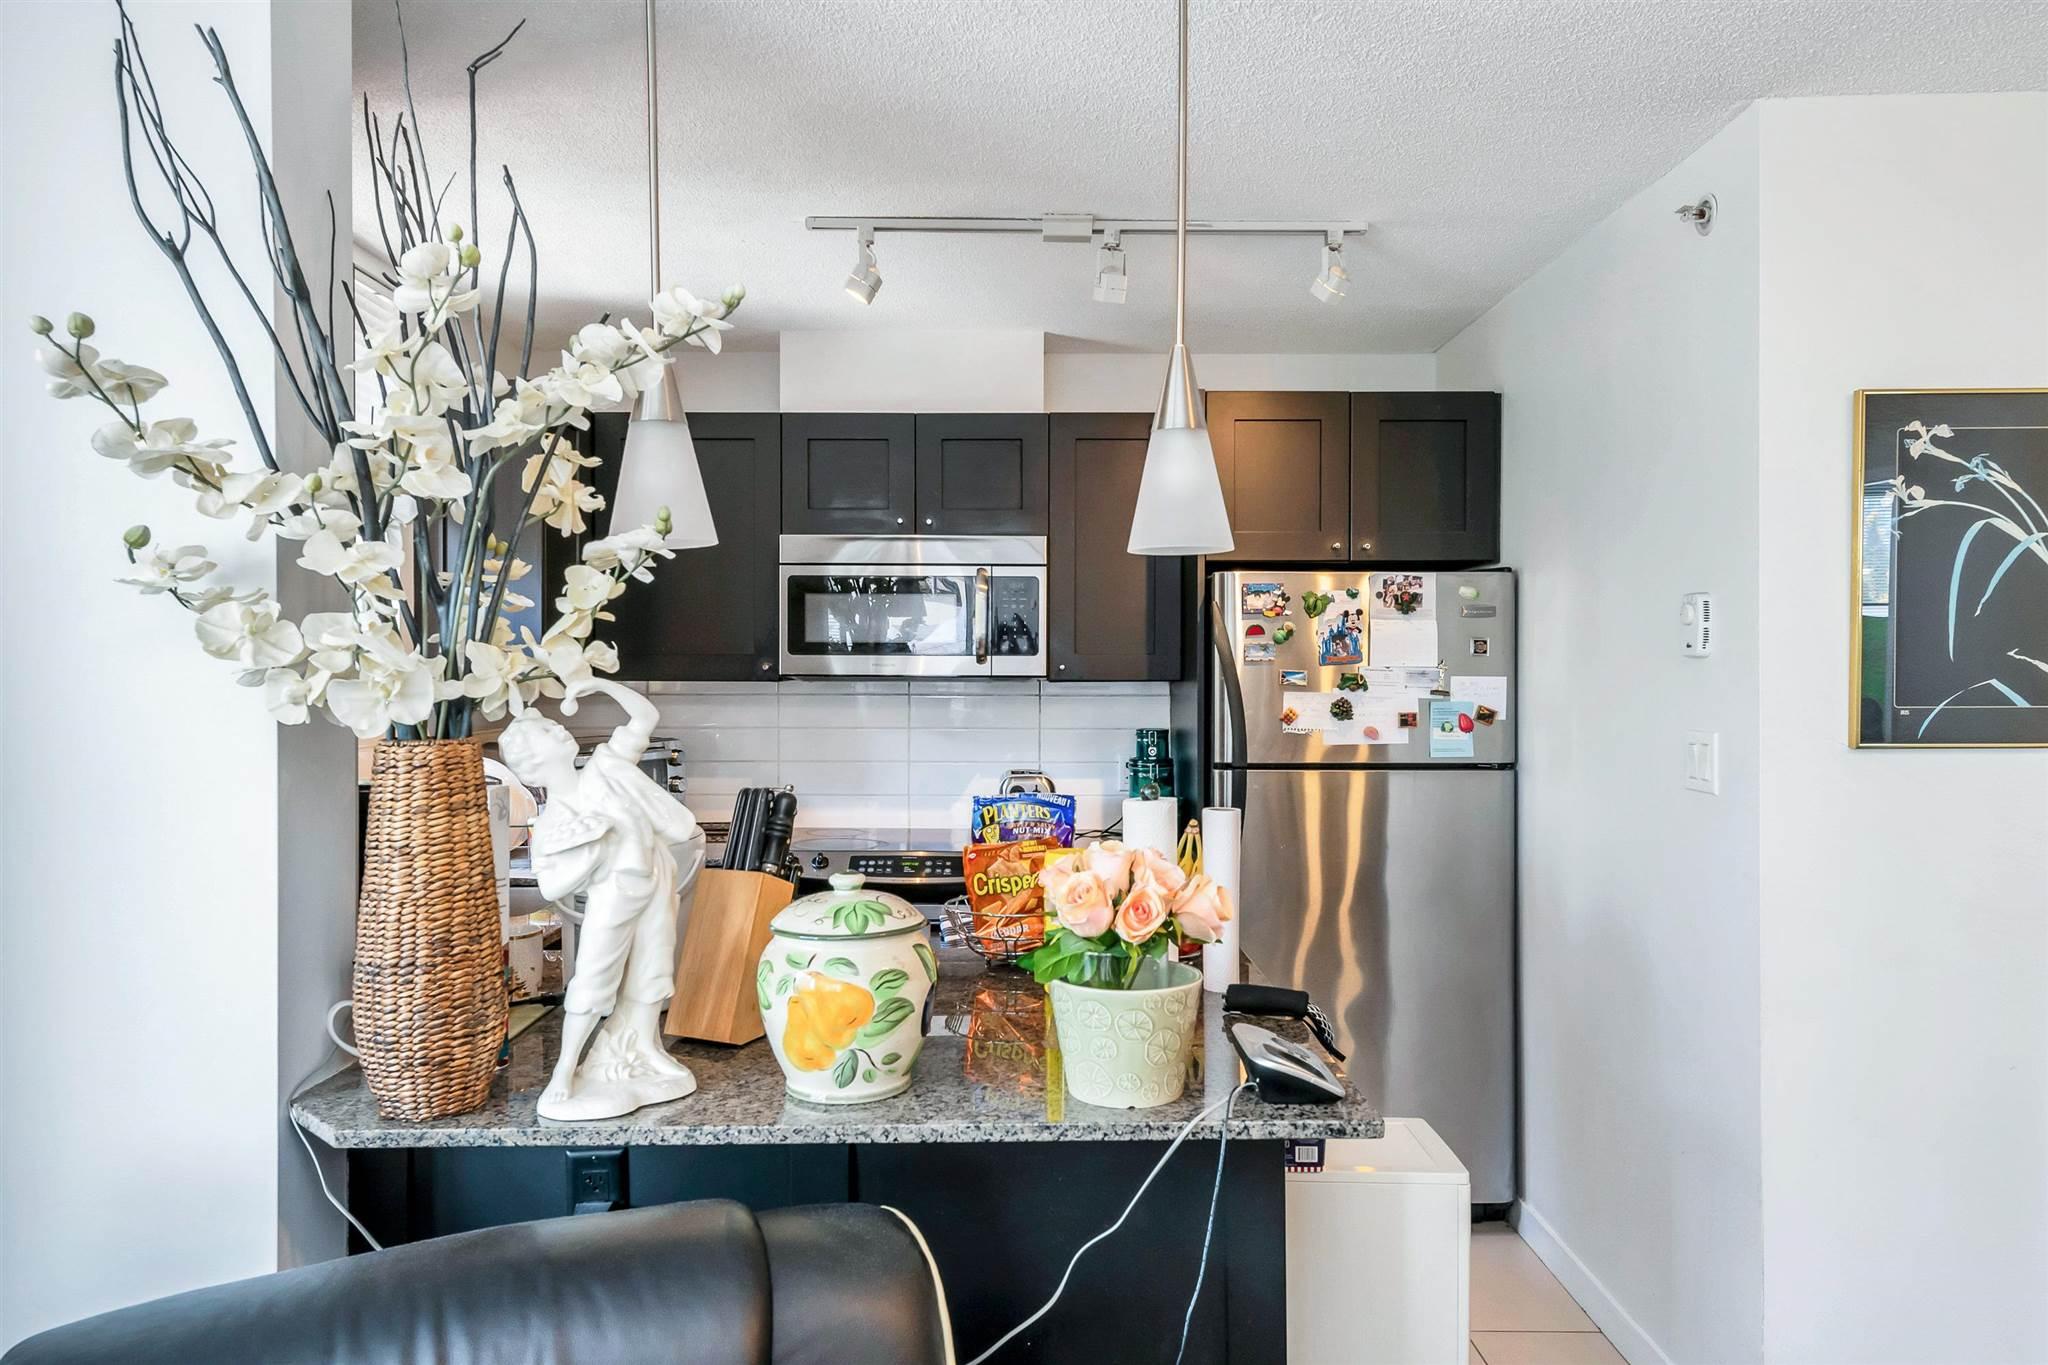 205 7225 ACORN AVENUE - Highgate Apartment/Condo for sale, 2 Bedrooms (R2606454) - #5